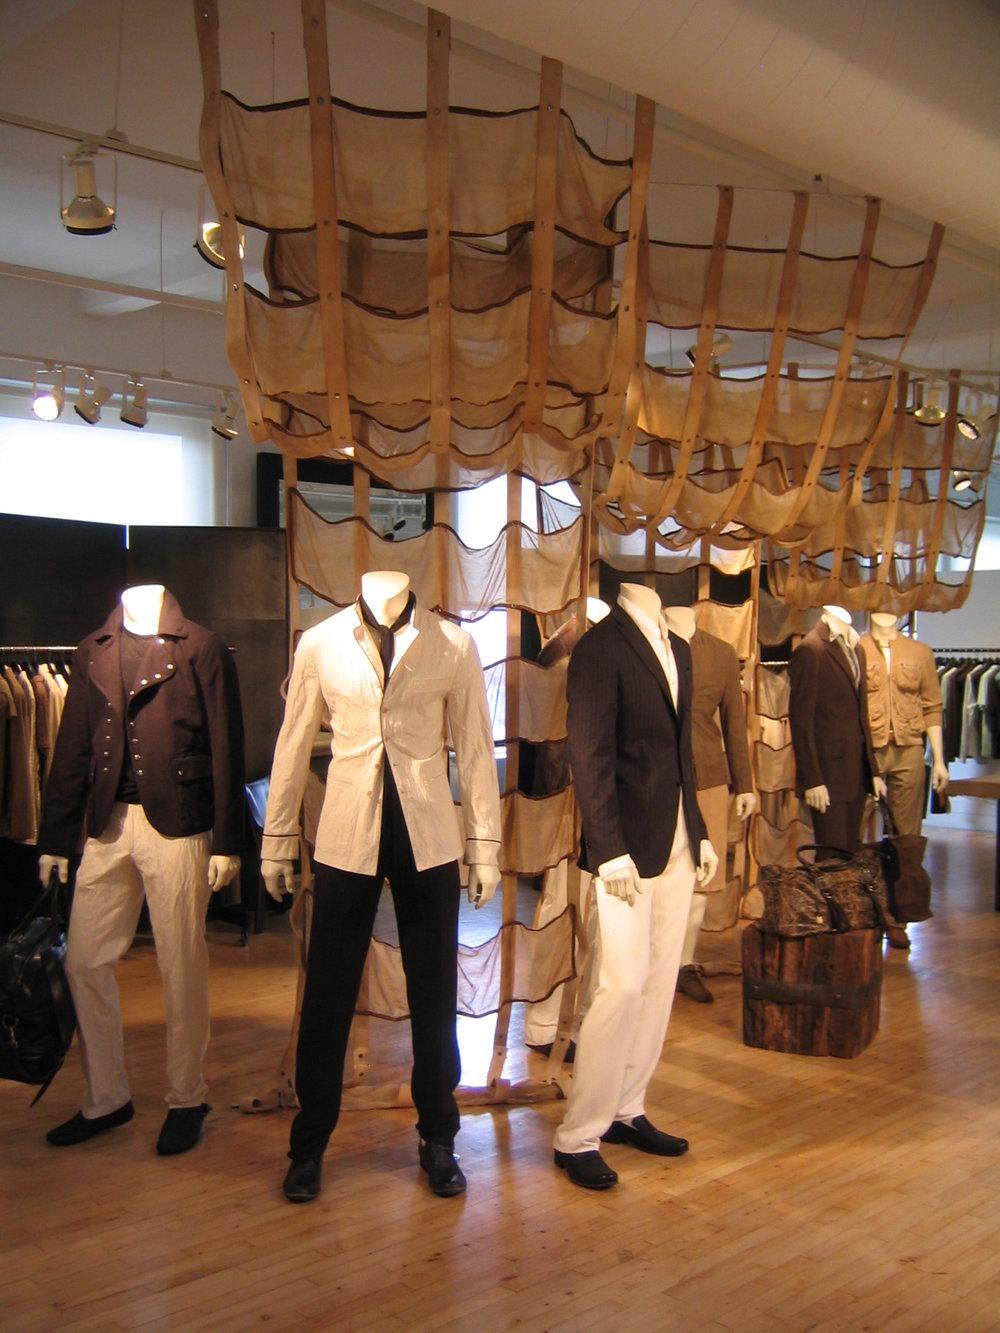 stores_25.JPG